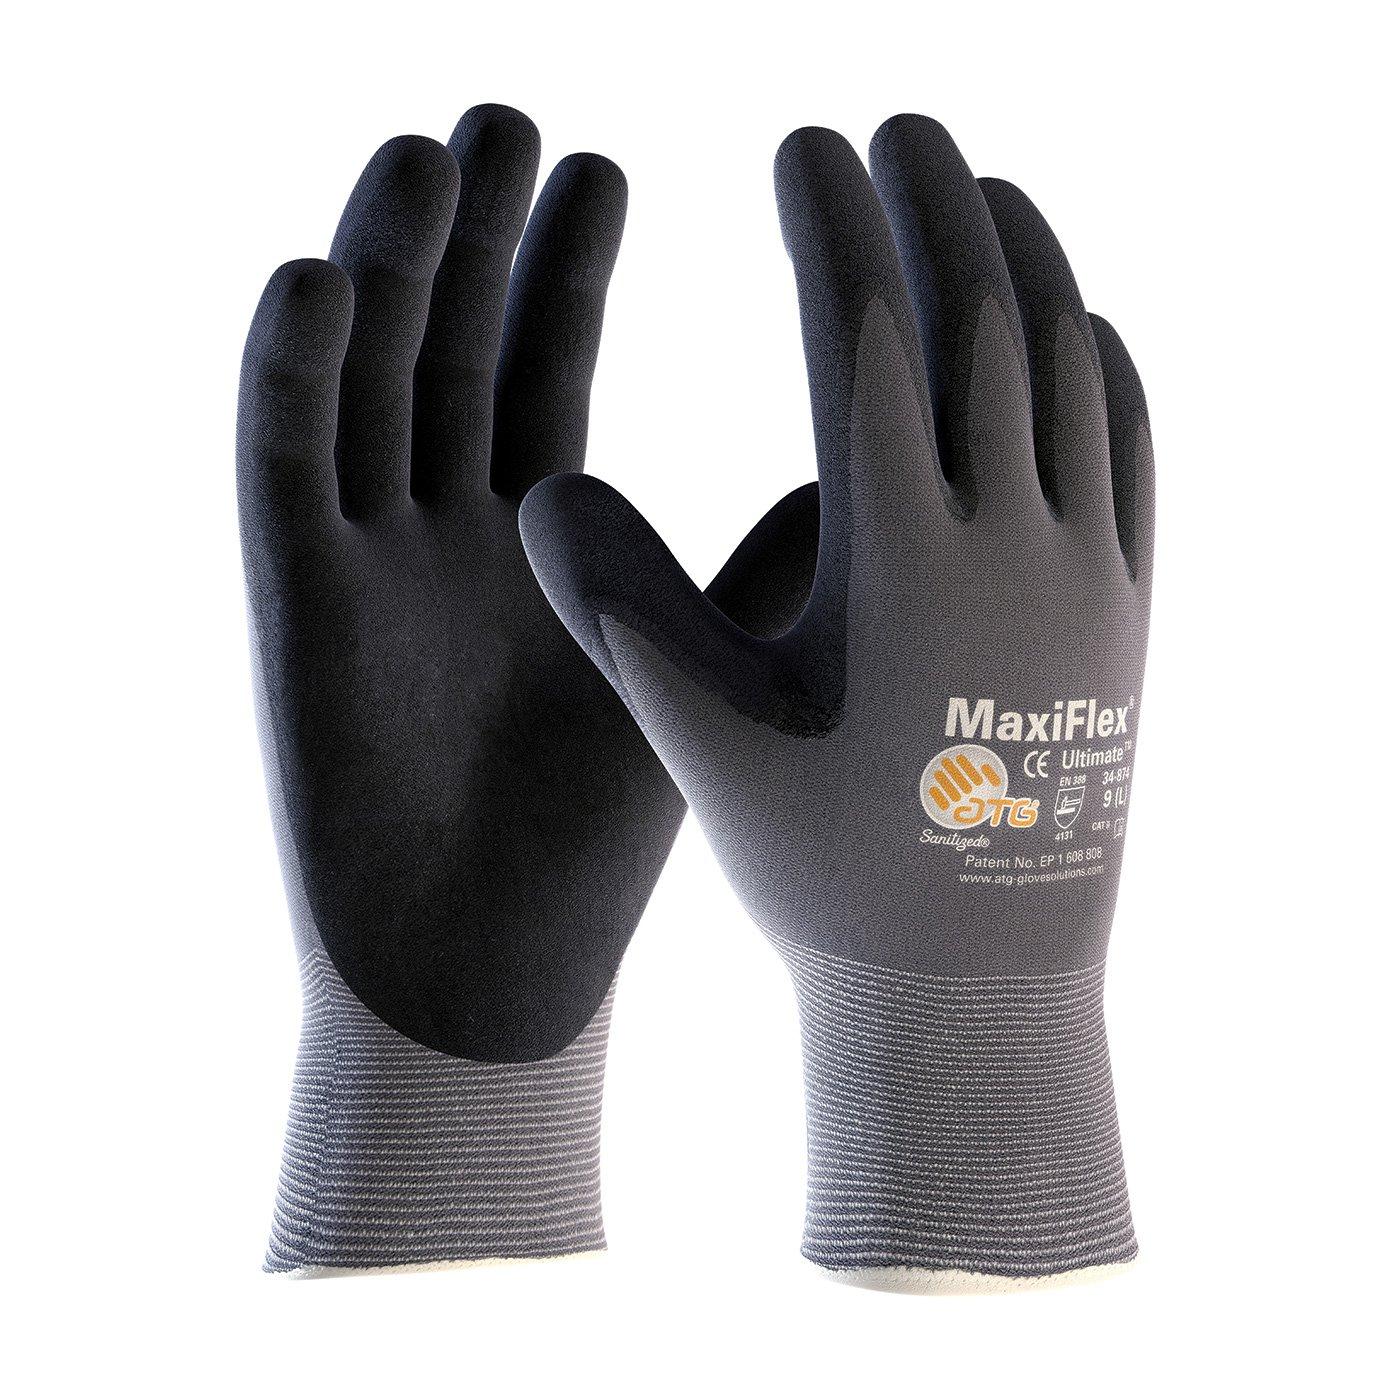 ATG 34-874/XL MaxiFlex Ultimate - Nylon, Micro-Foam Nitrile Grip Gloves - Black/Gray - X-Large - 12 Pair Per Pack by Maxiflex